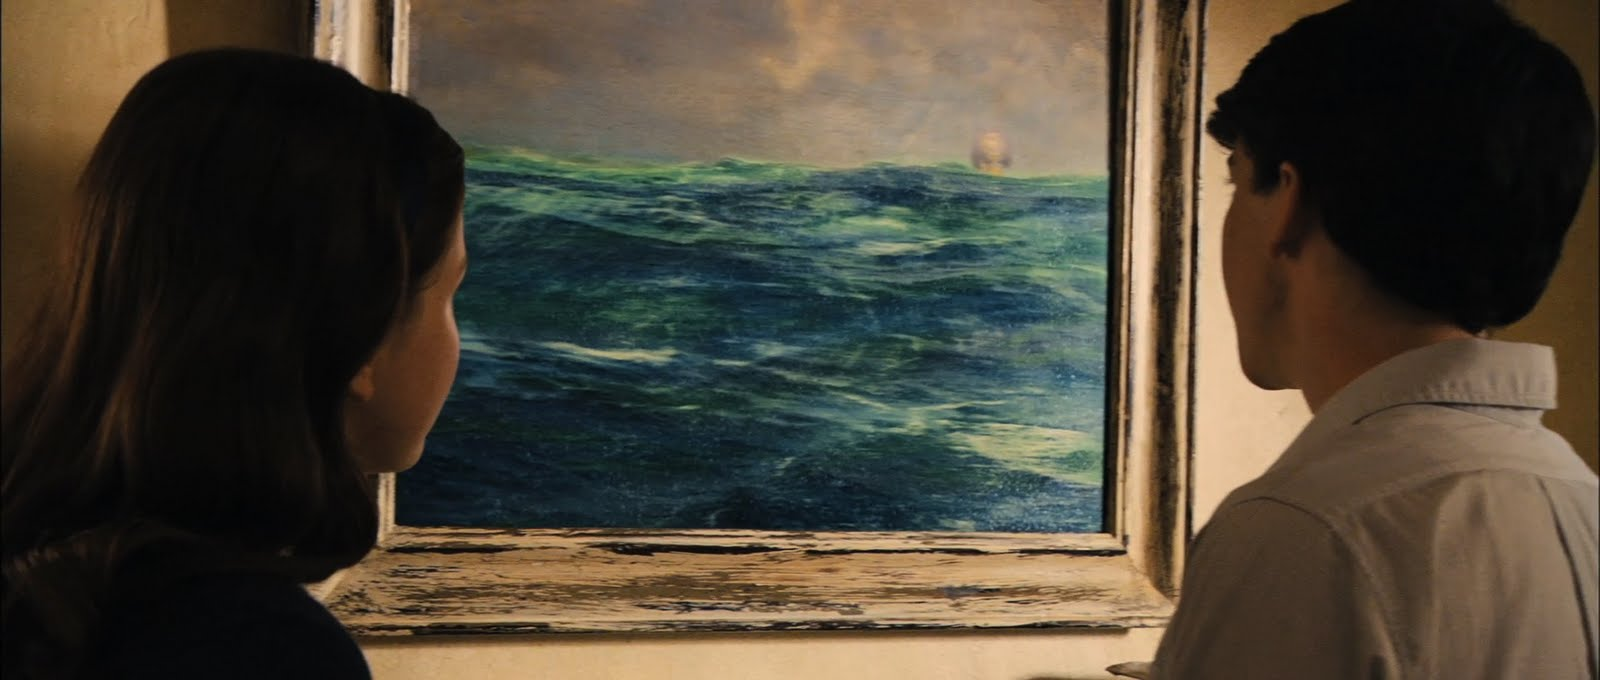 De beste trilogie n narnia - Schilderij in de kamer ...